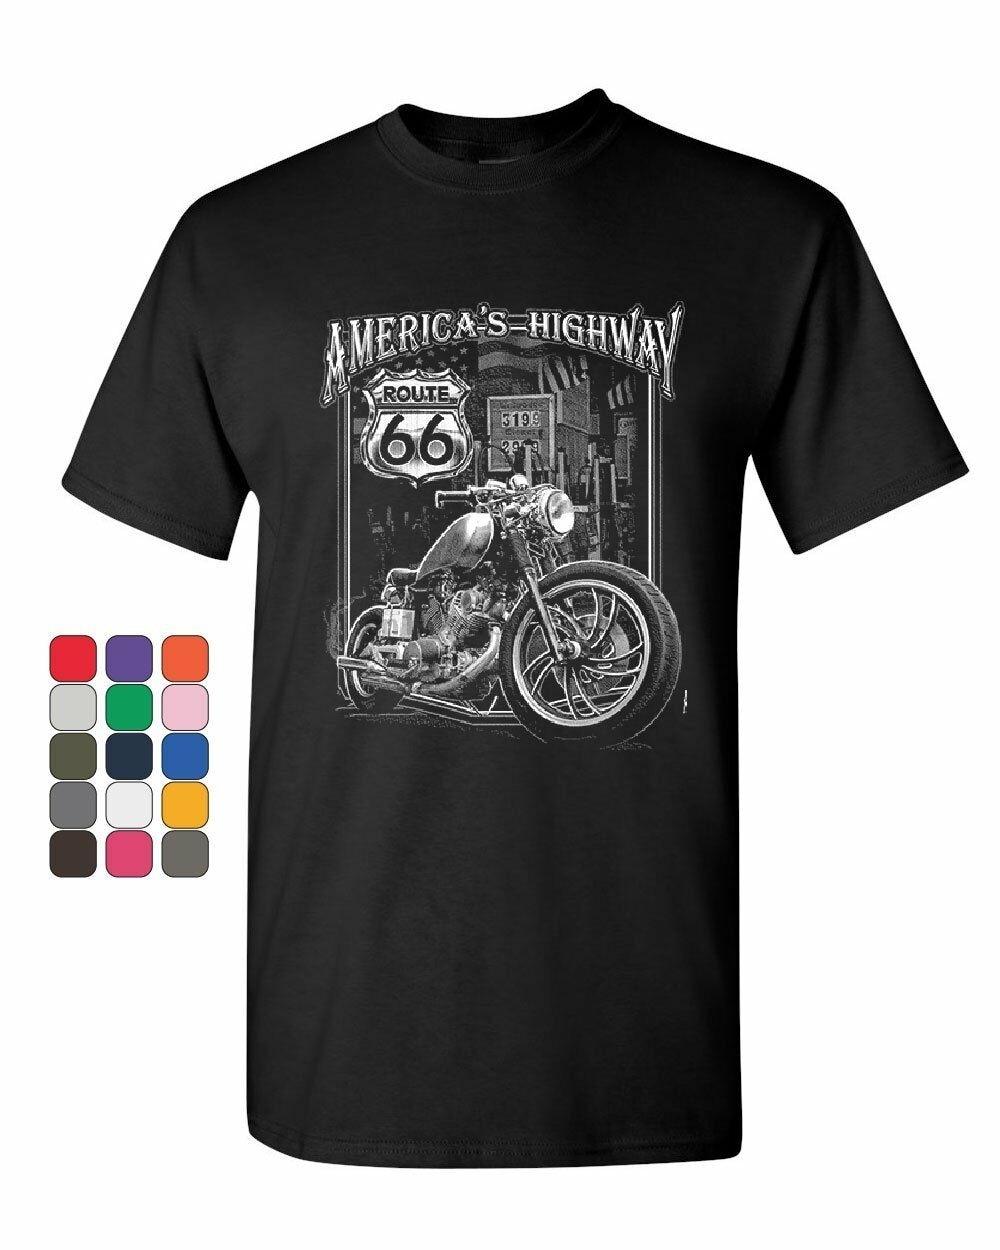 América Highway camiseta Ruta 66 MC motocicleta Chopper Bobber hombres camiseta